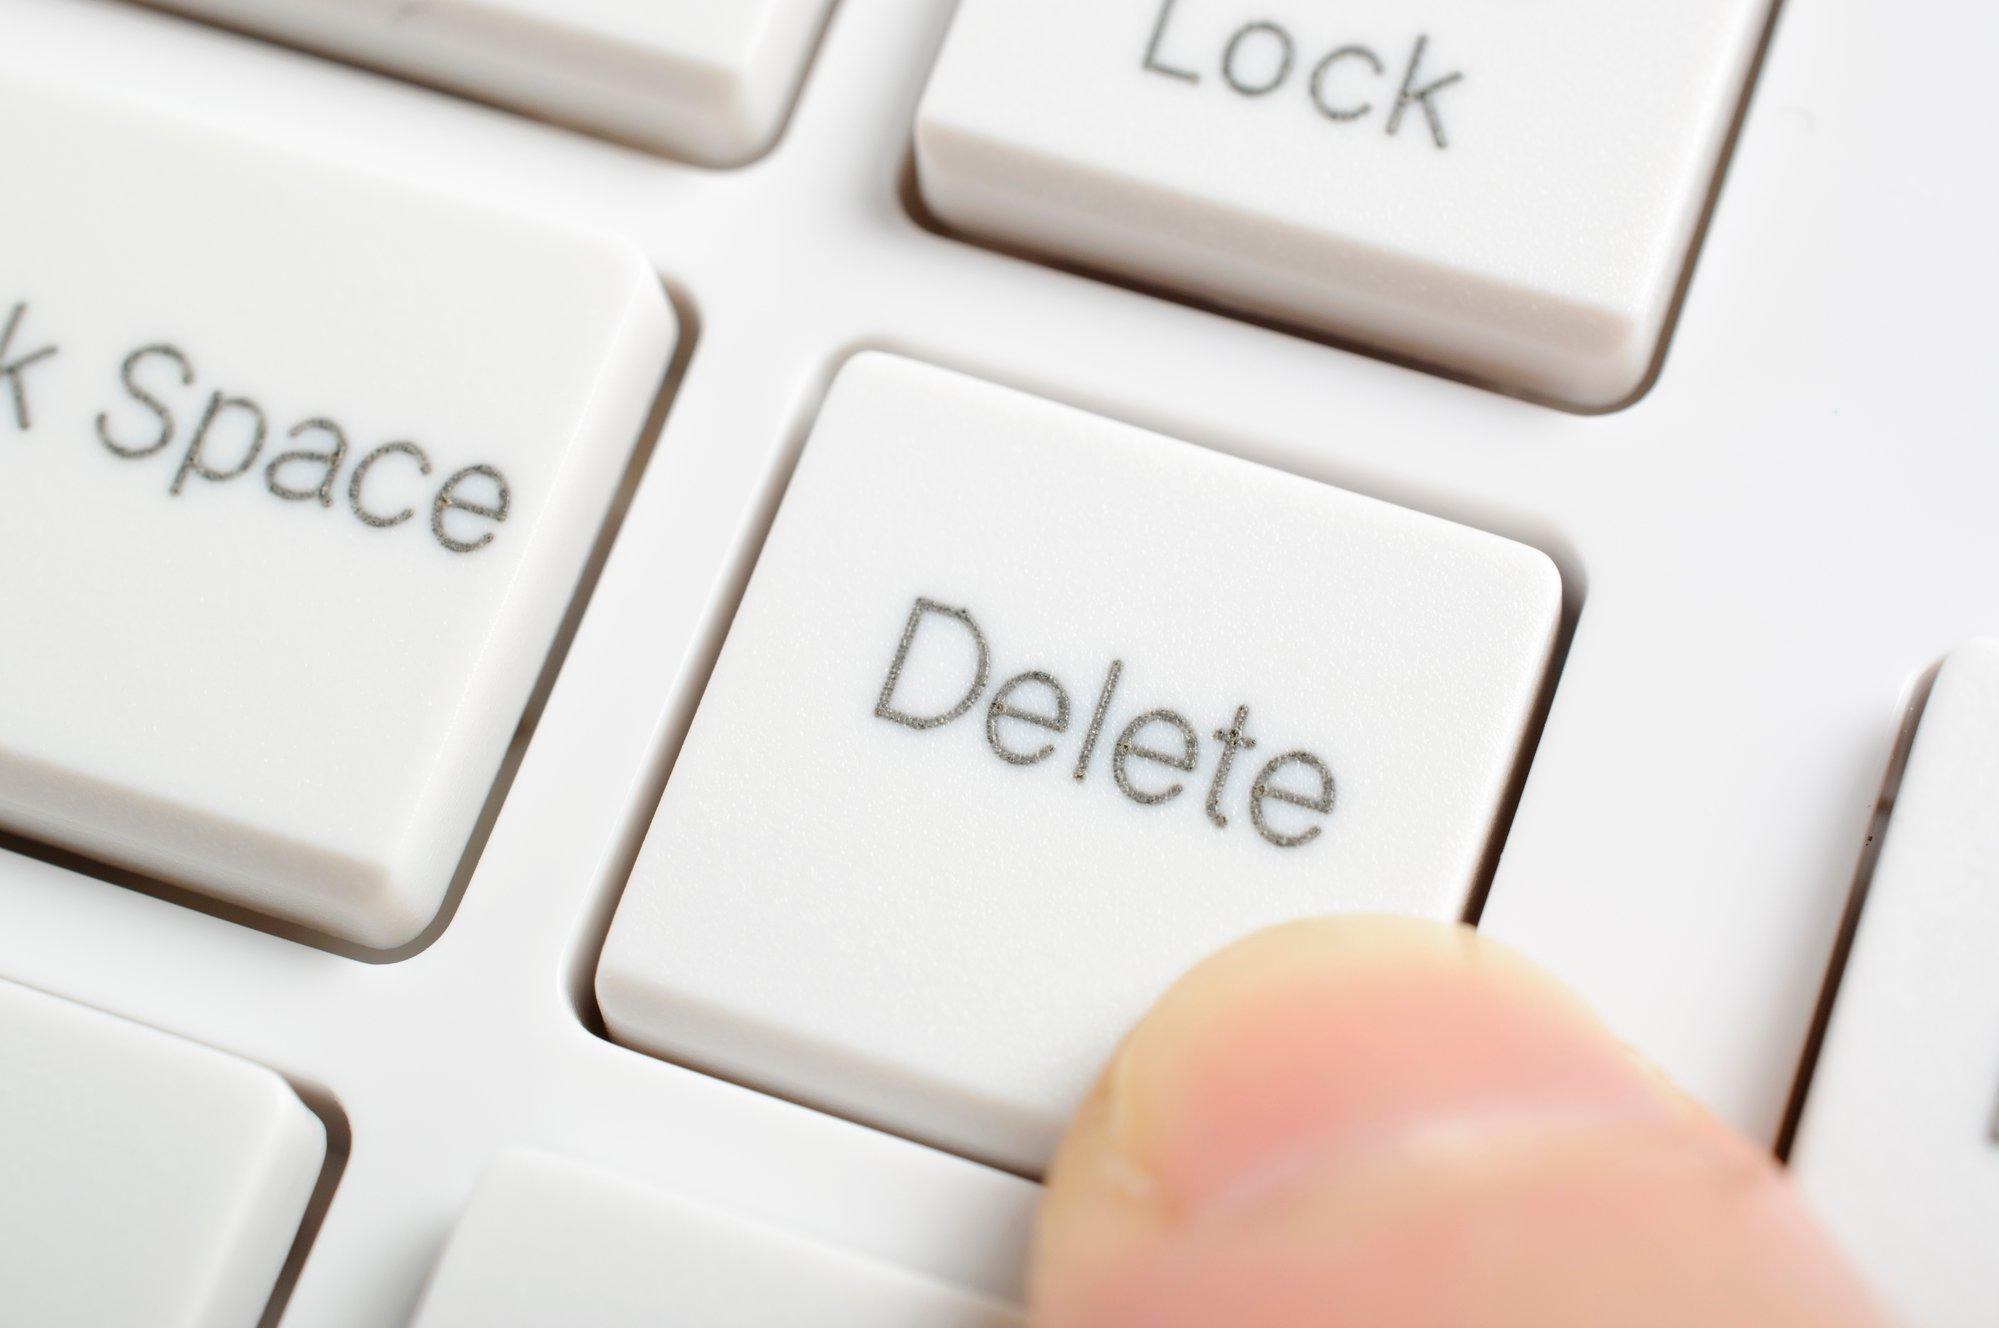 Pressing delete key